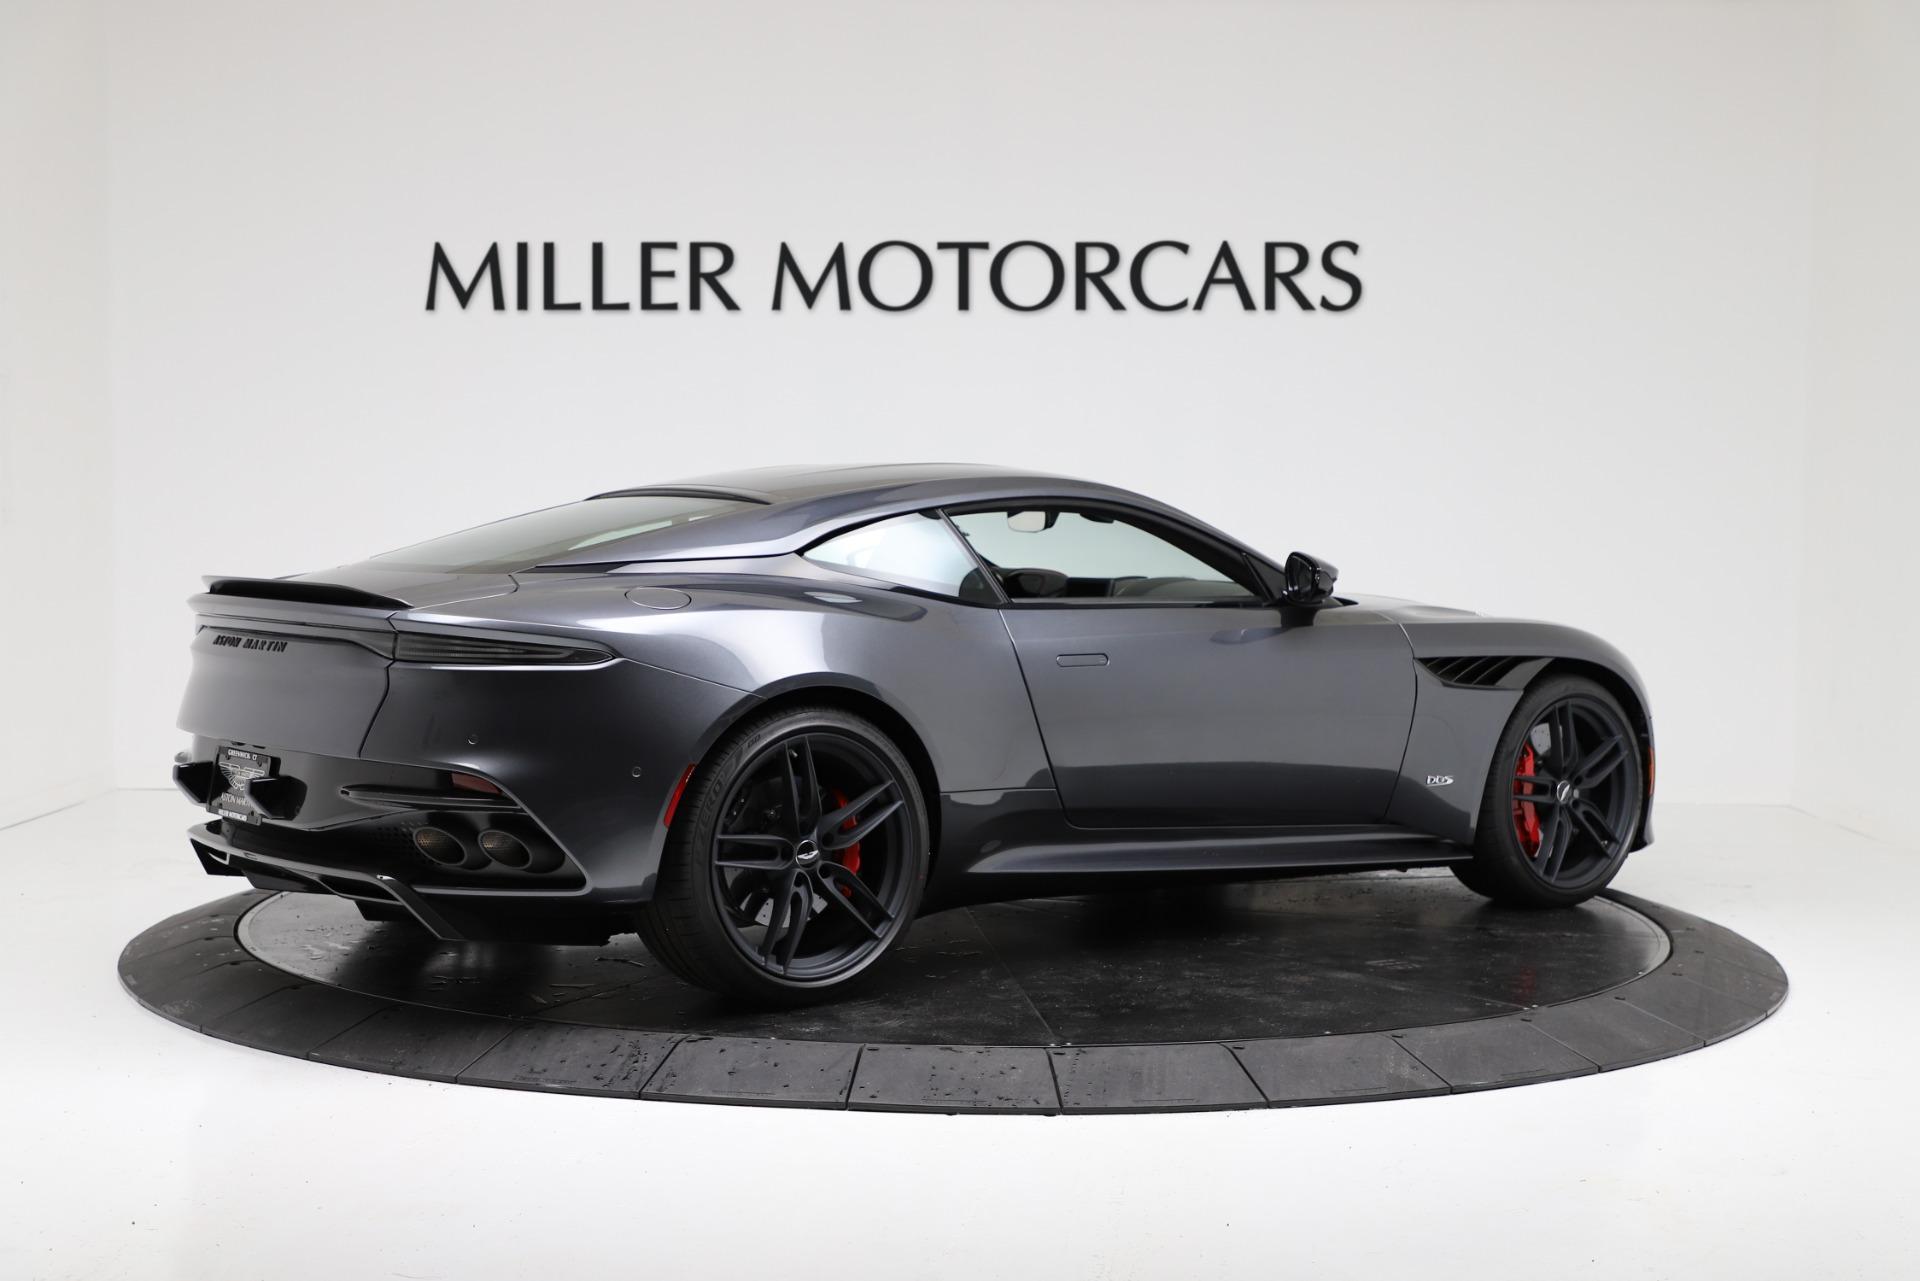 New 2019 Aston Martin Dbs Superleggera Coupe For Sale Miller Motorcars Stock A1379